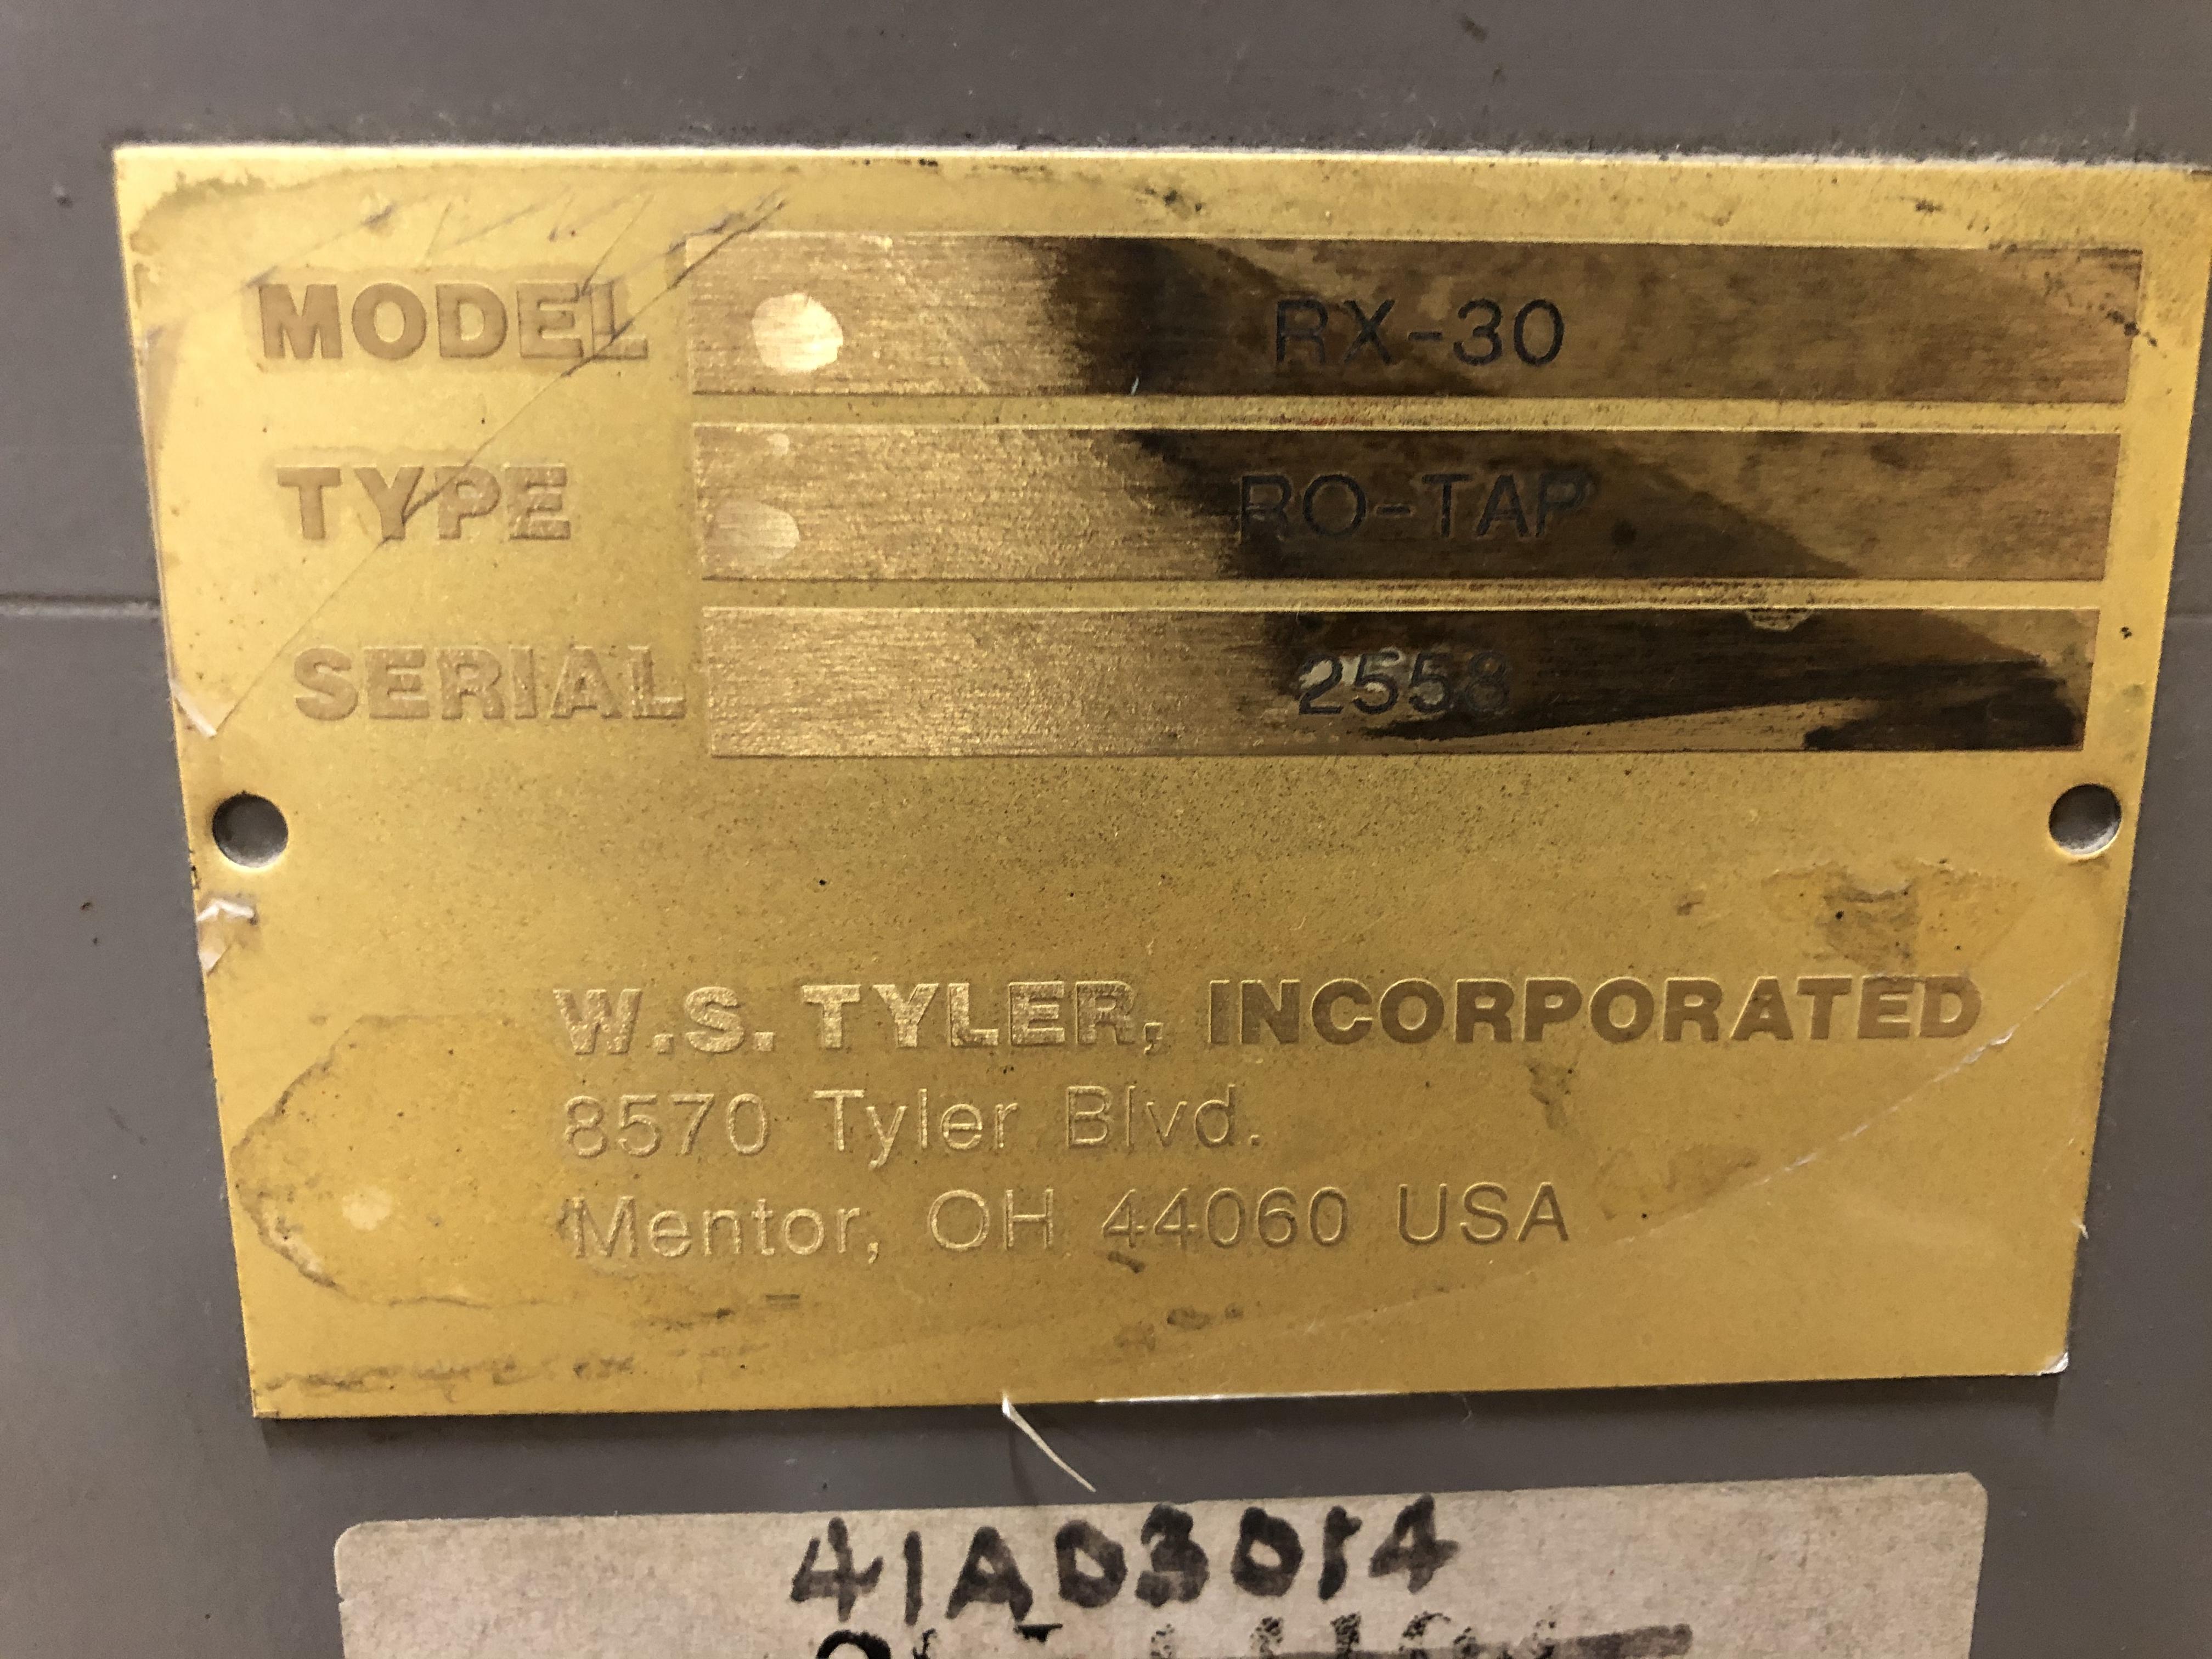 W.S. Tyler Inc Shaker, Model# RX-30, Type RO-TAP, Serial# 2558 - Image 3 of 4